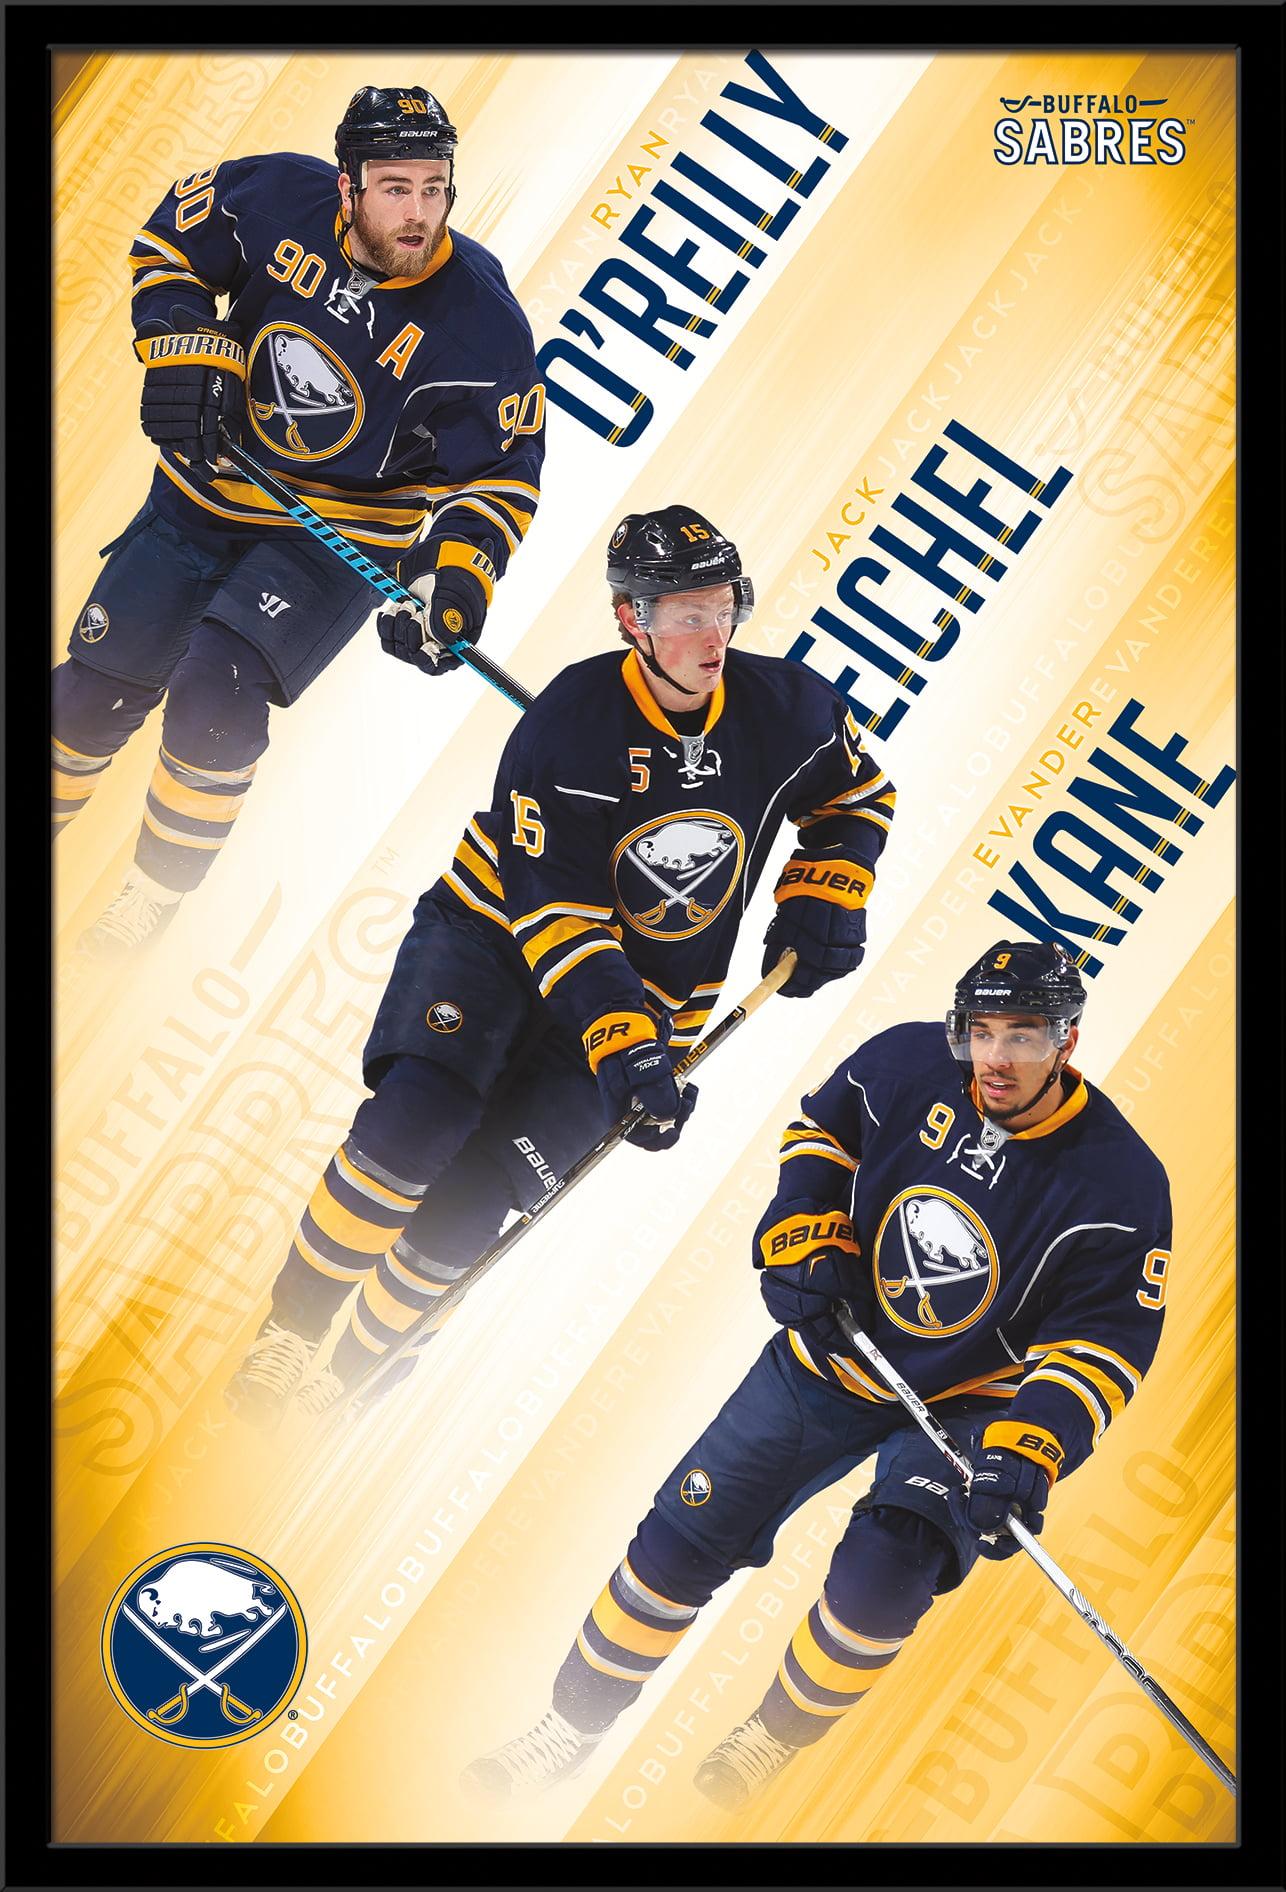 Buffalo Sabres - Team - Walmart.com